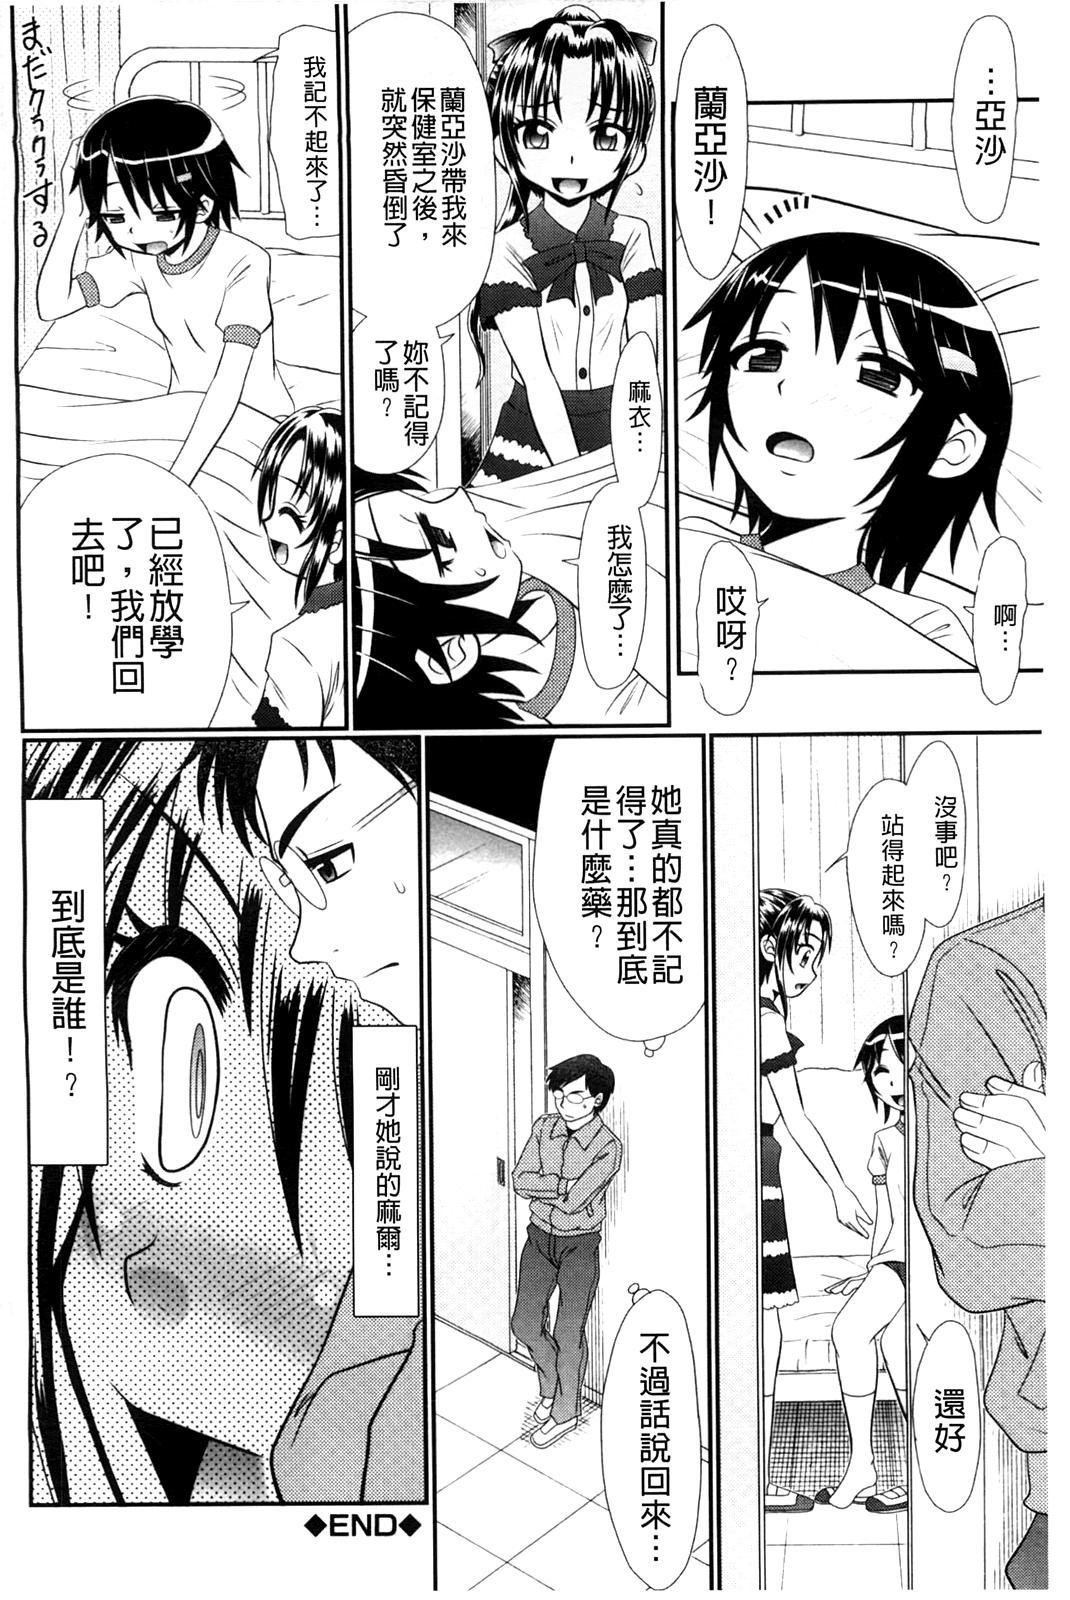 Higyaku Kyoushitsu 132